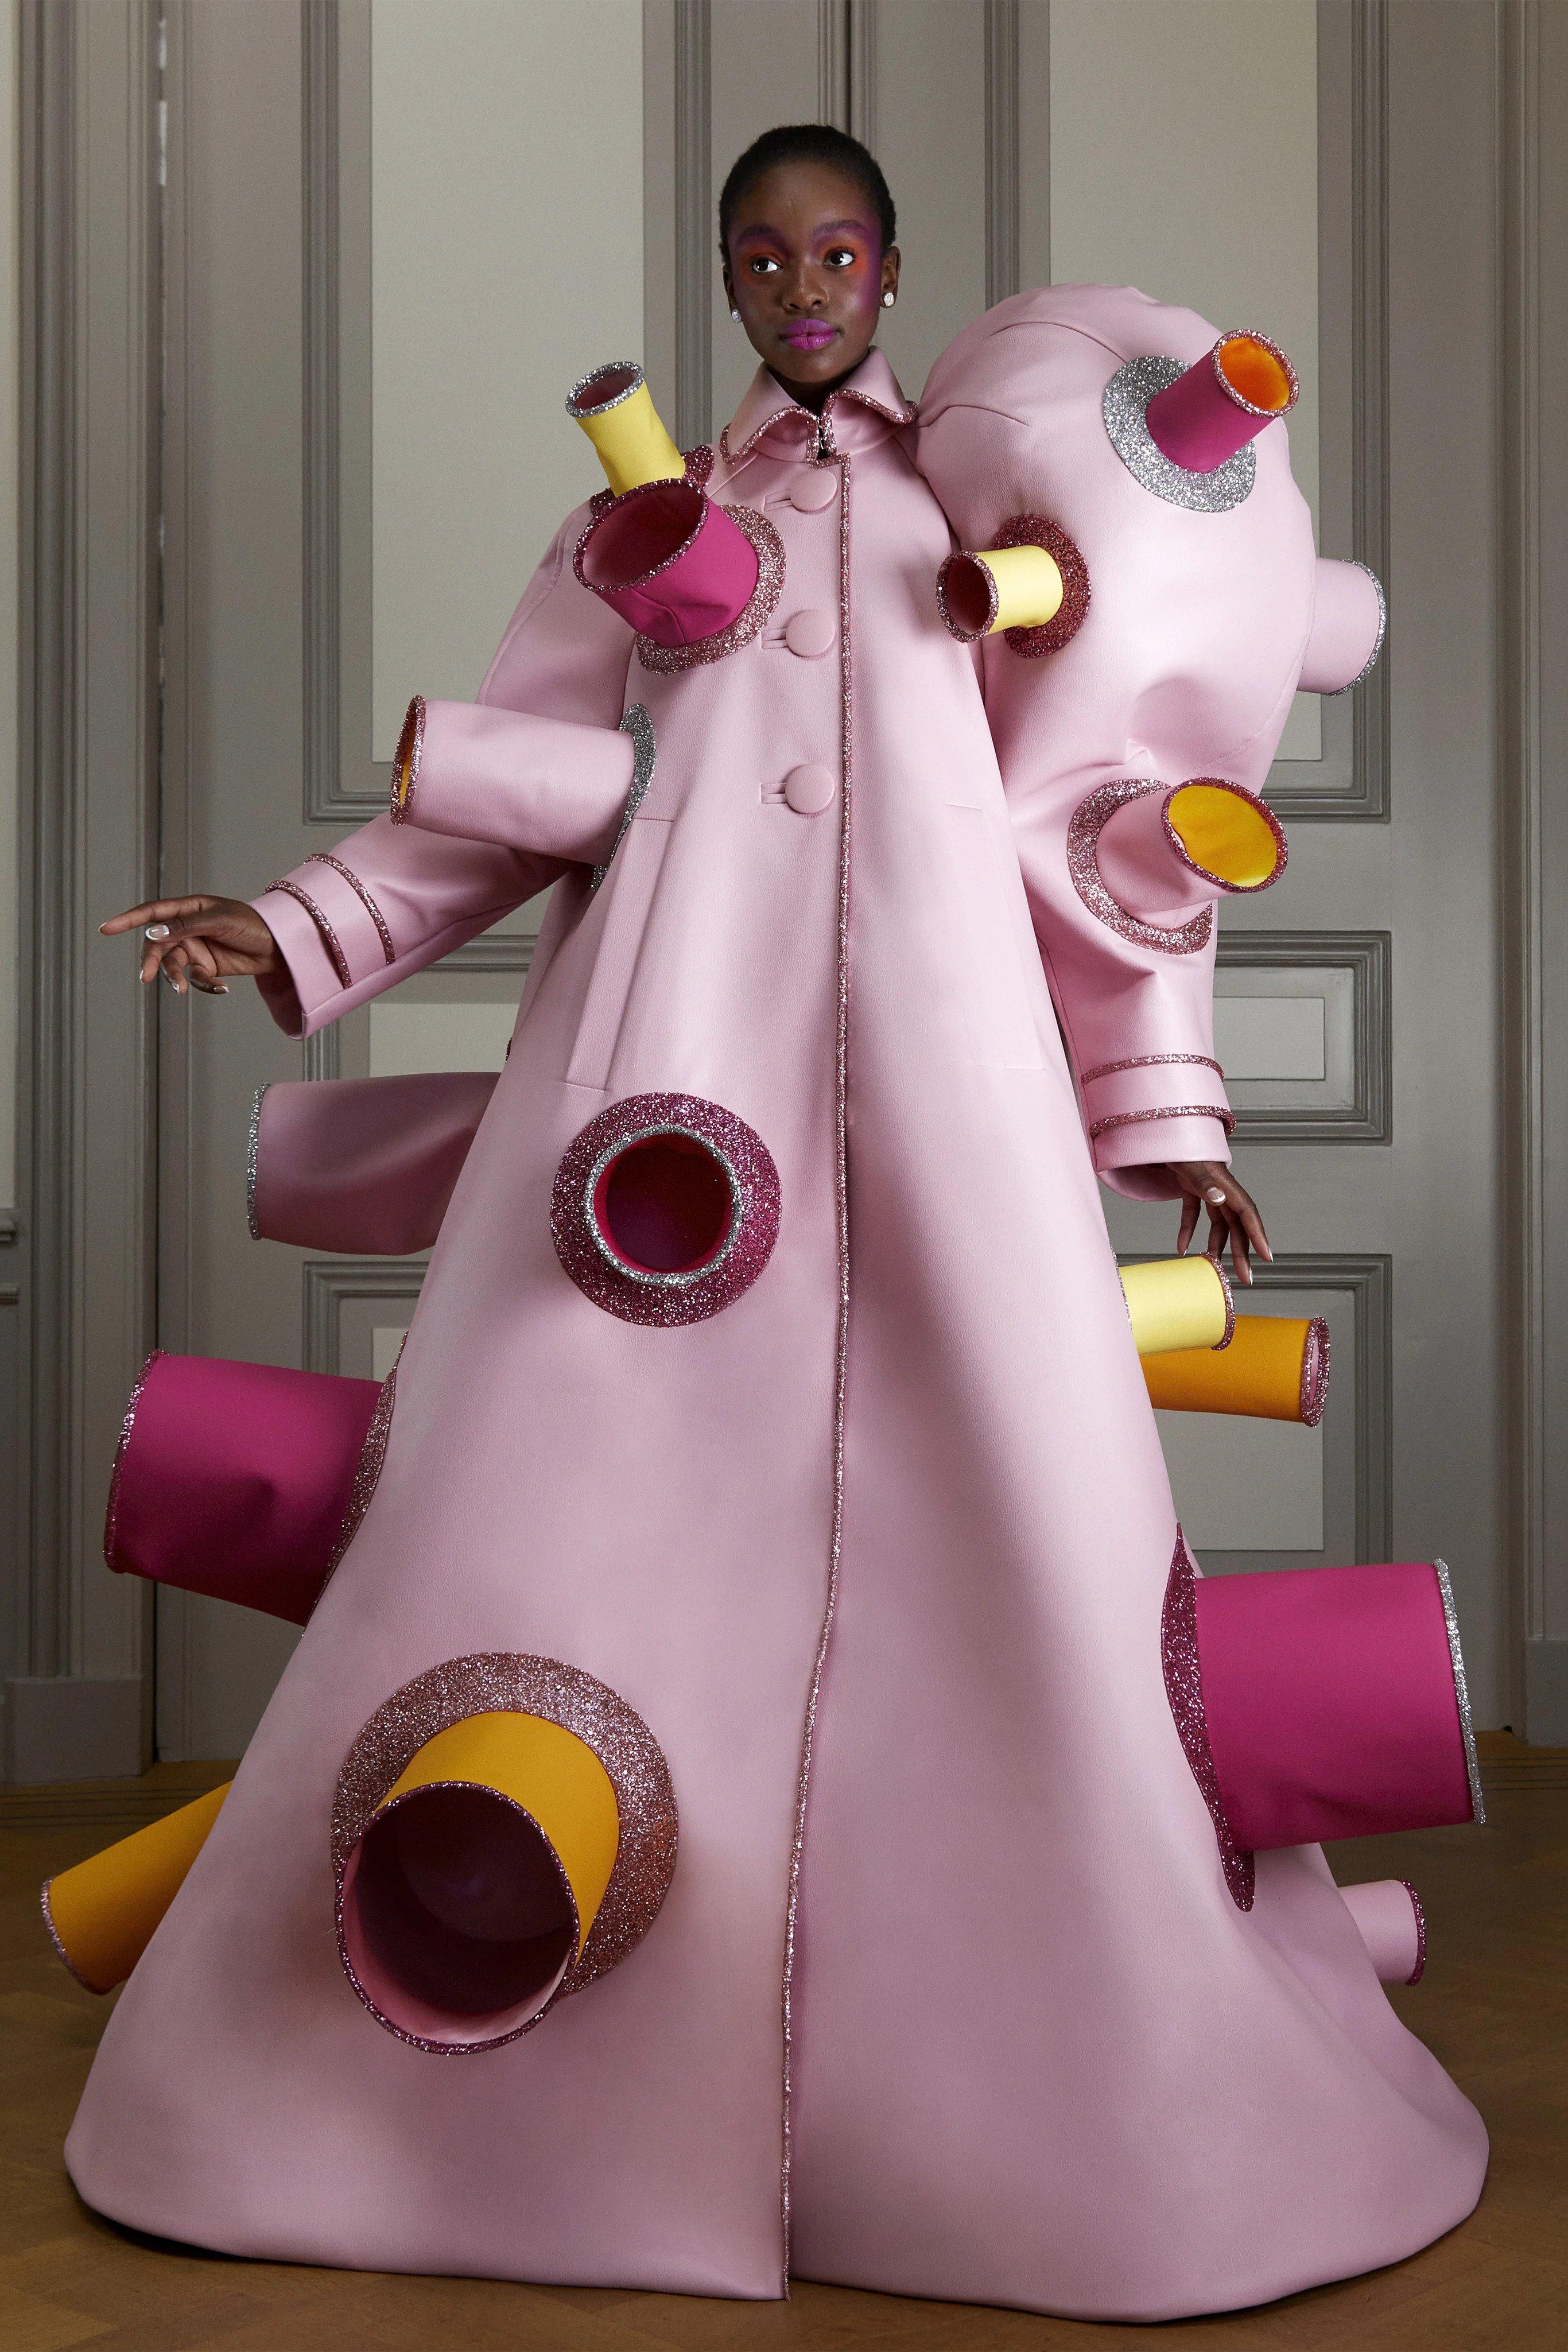 Viktor & Rolf Haute Couture. Image credit: Caspi Kofi for Victor & Rolf